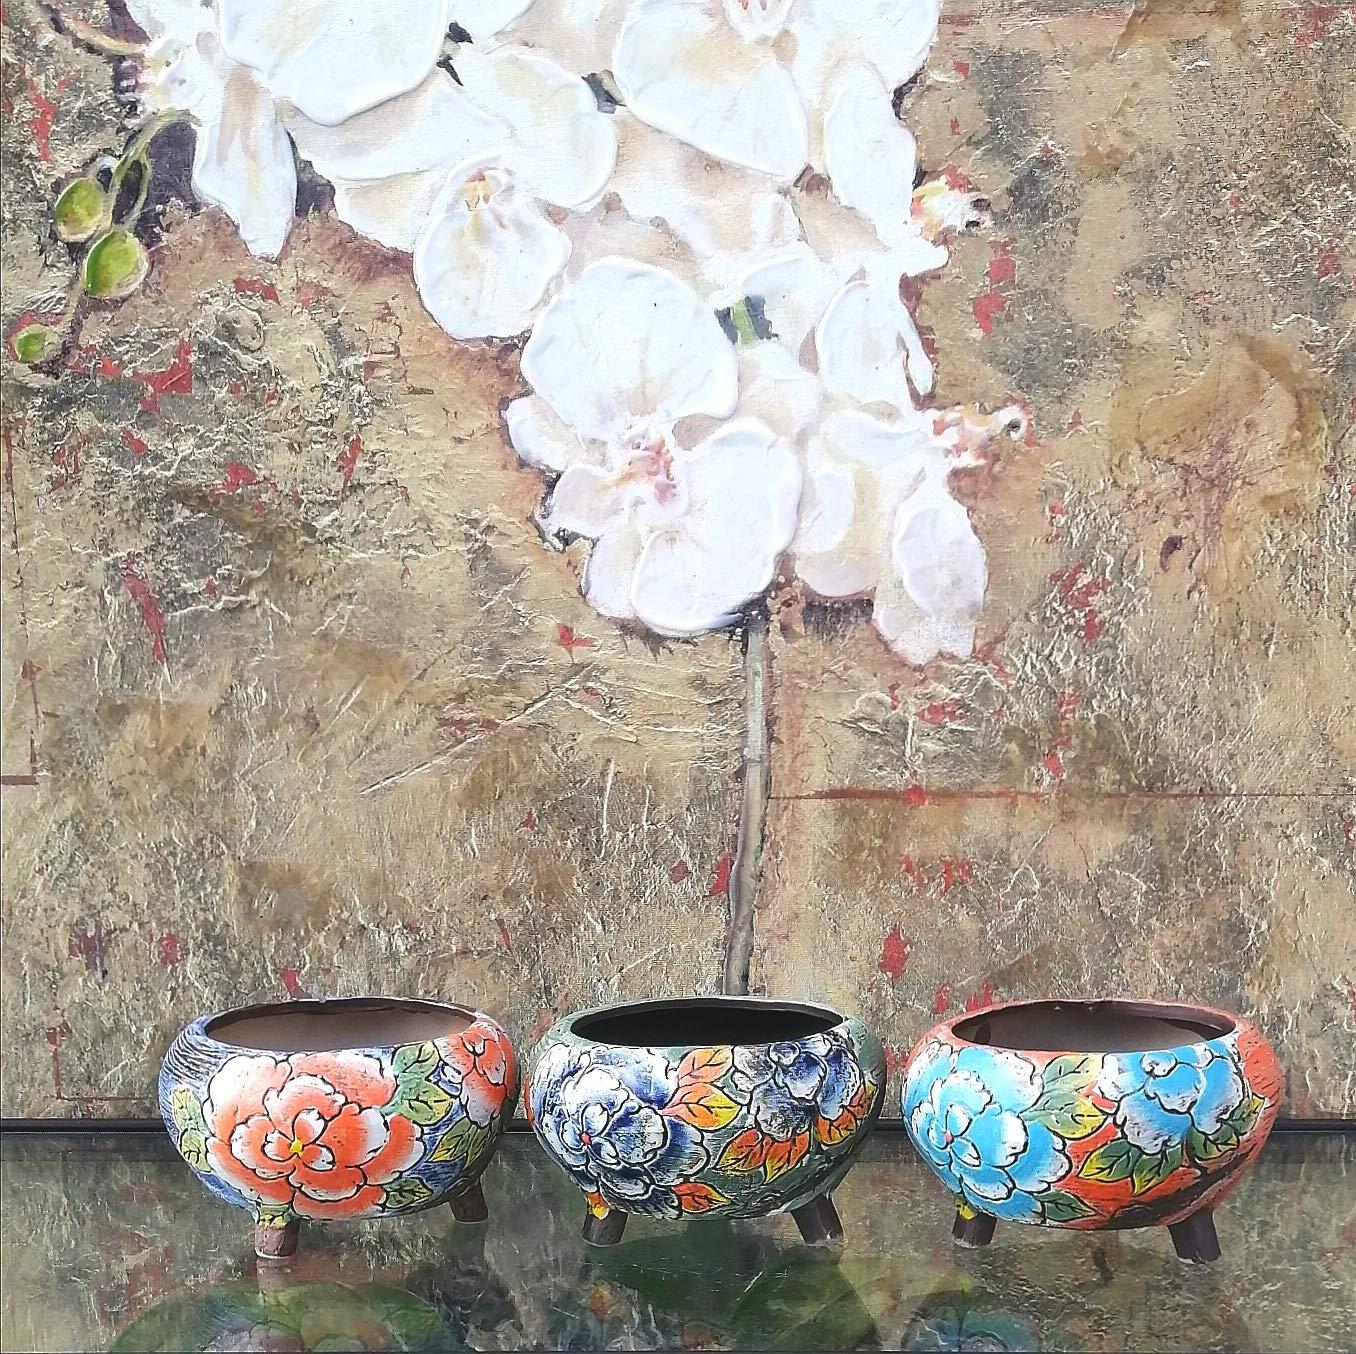 Hand Carved /& Painted Ceramic Plant Pot with Drainage Succulent Cactus Herb Planter Flower Vase Home Decor